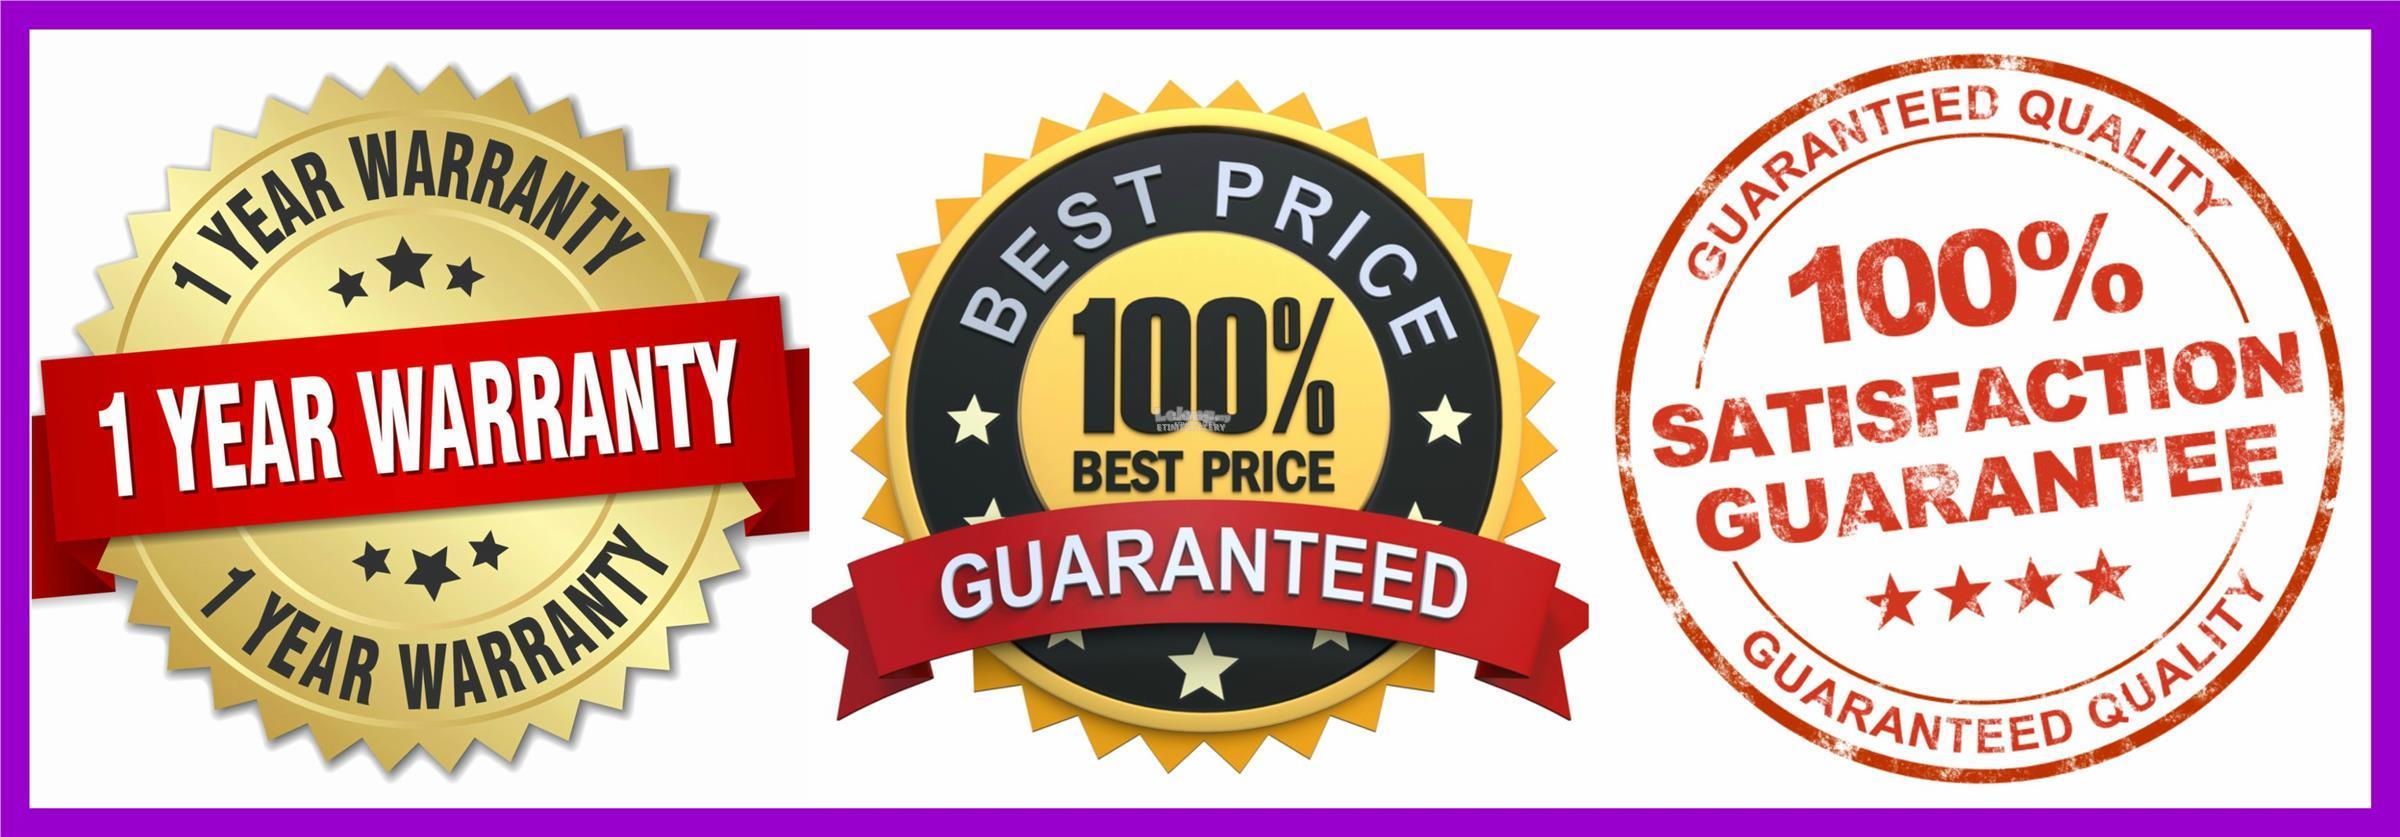 Original Warranty Casio Ae 1000w End 11 24 2019 515 Pm Jam Tangan 1b Youth Men Series Digital Watch